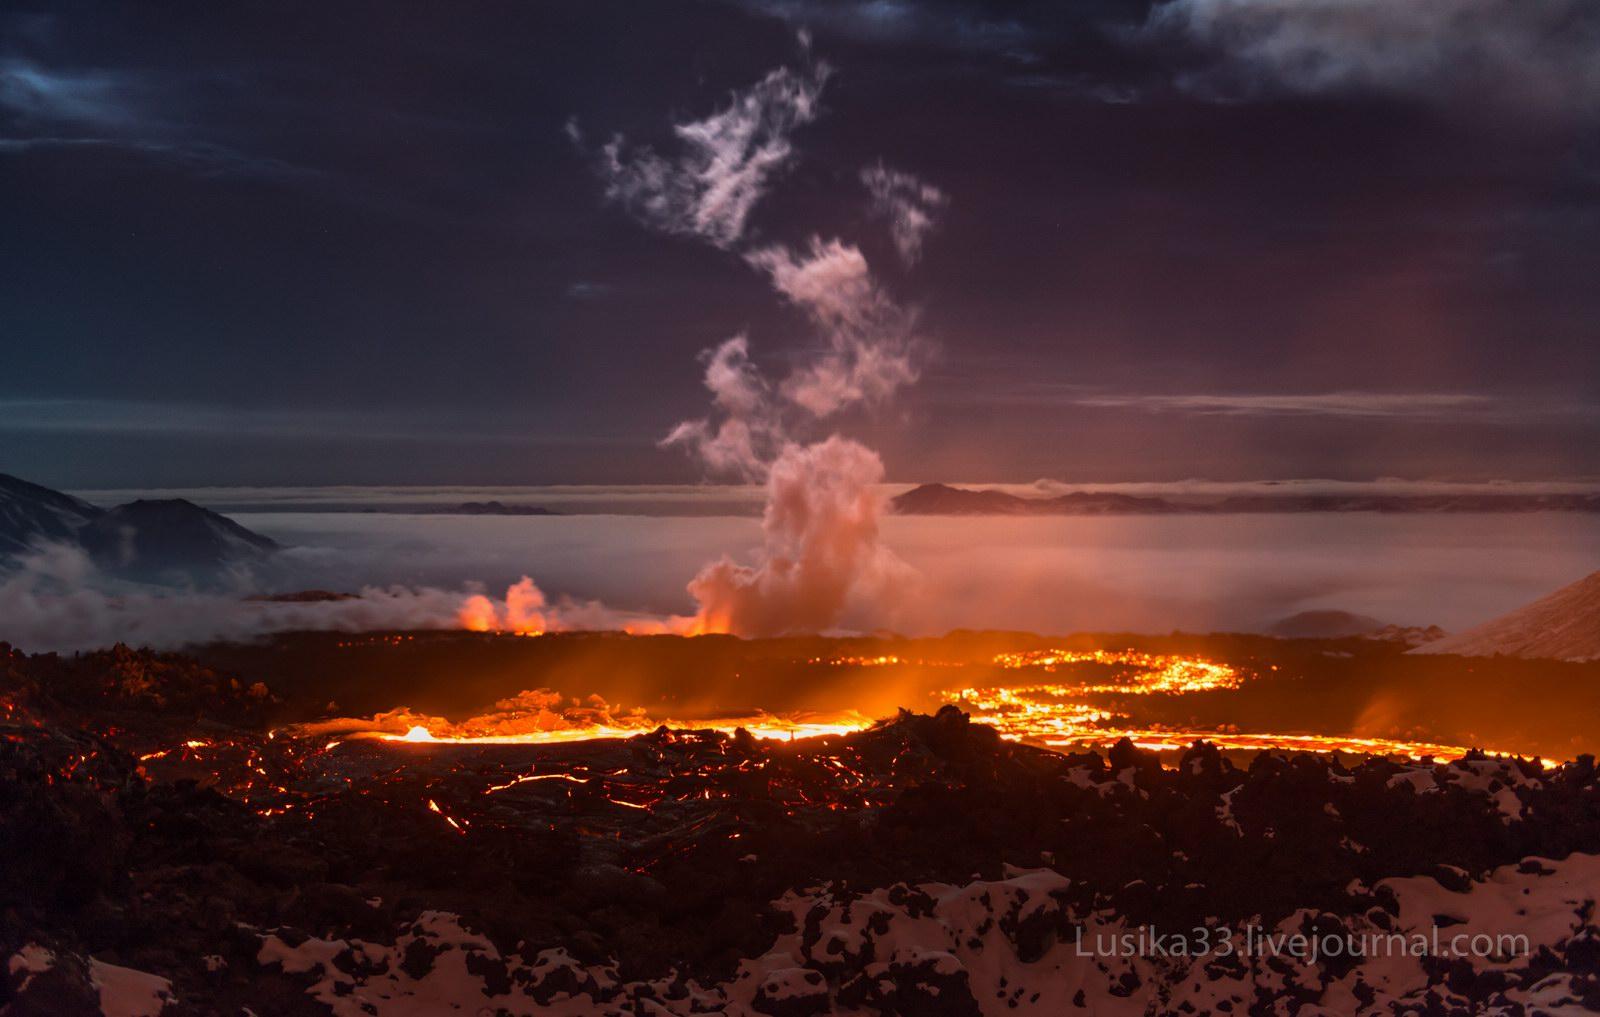 The Eruption Of The Volcano Tolbachik In Kamchatka